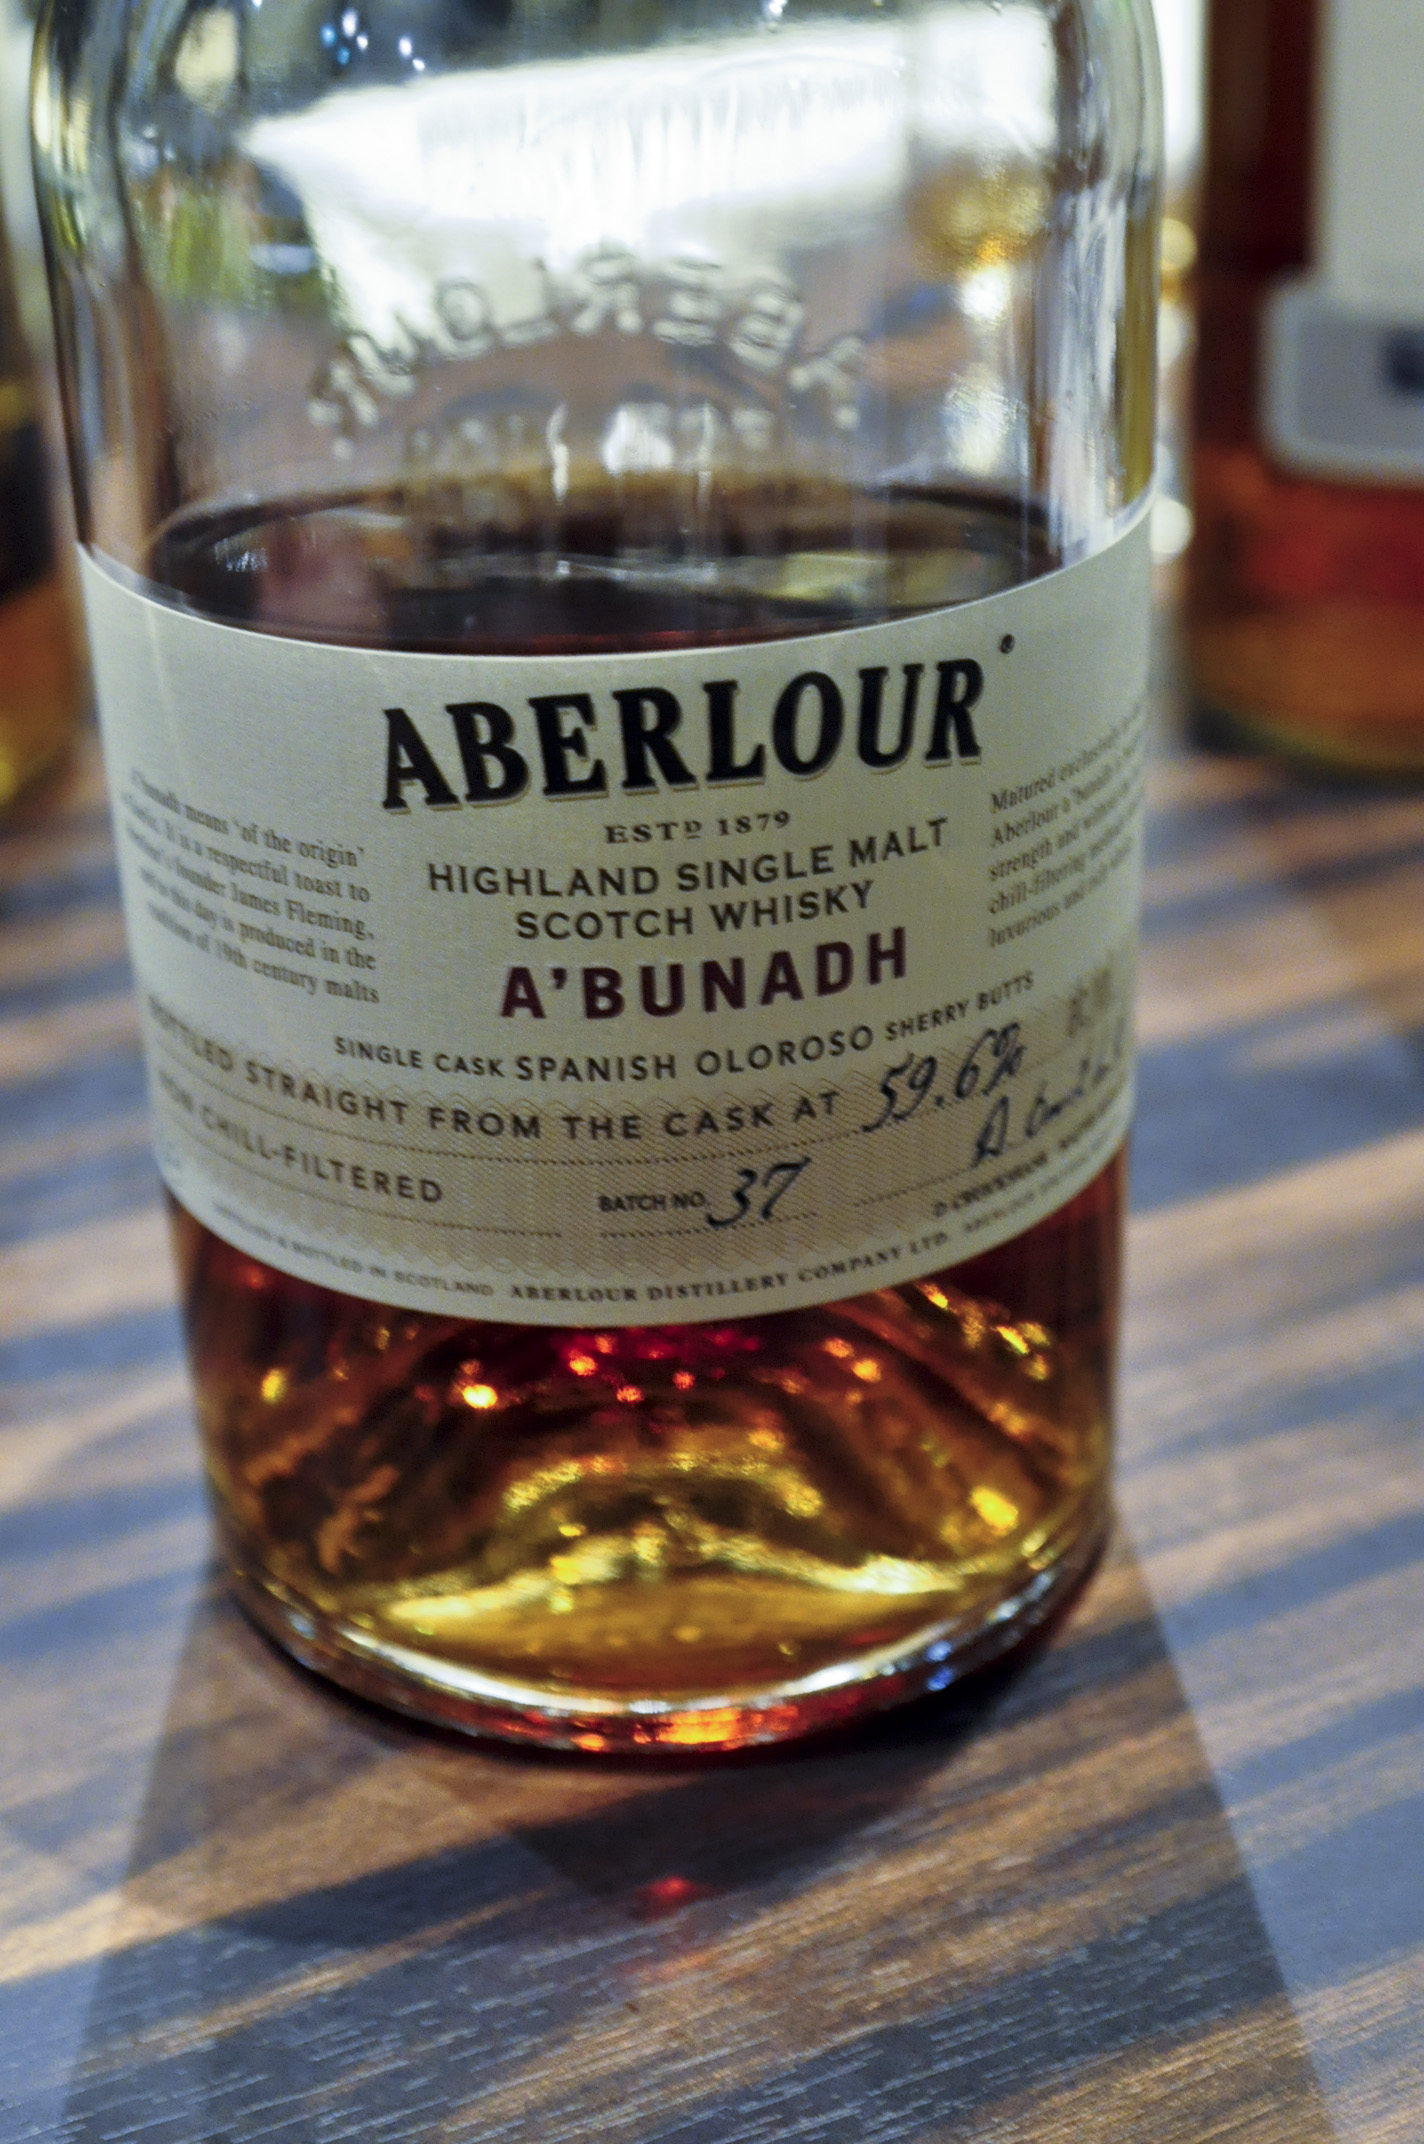 【BL/SC】 アベラワー Aberlour NAS 'A'bunadh' Batch #37 (59.6%, OB)